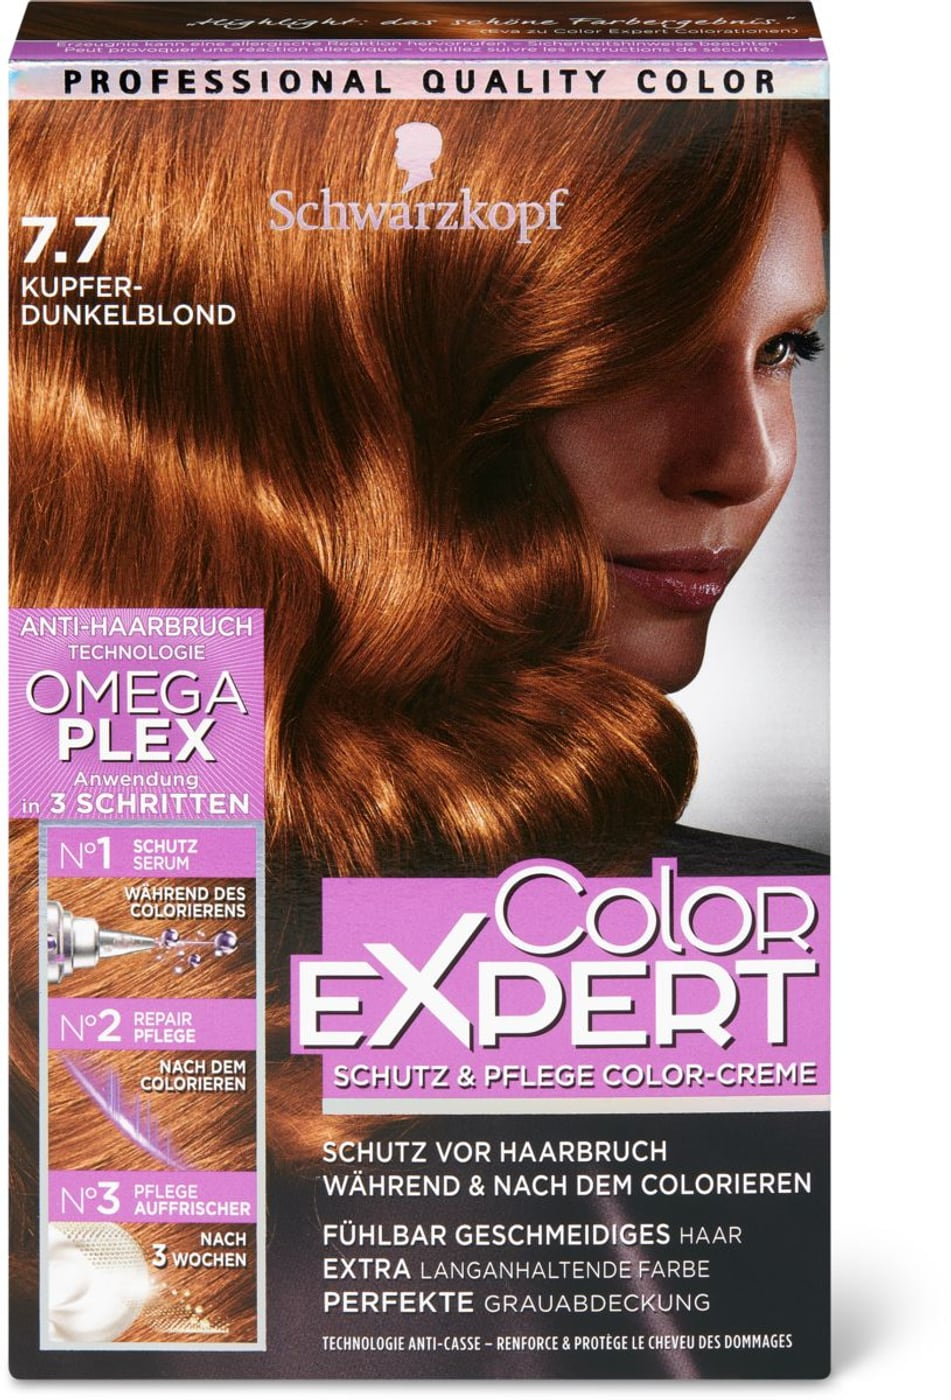 Schwarzkopf Color Expert 7.7 kupfer dunkelblond   Migros